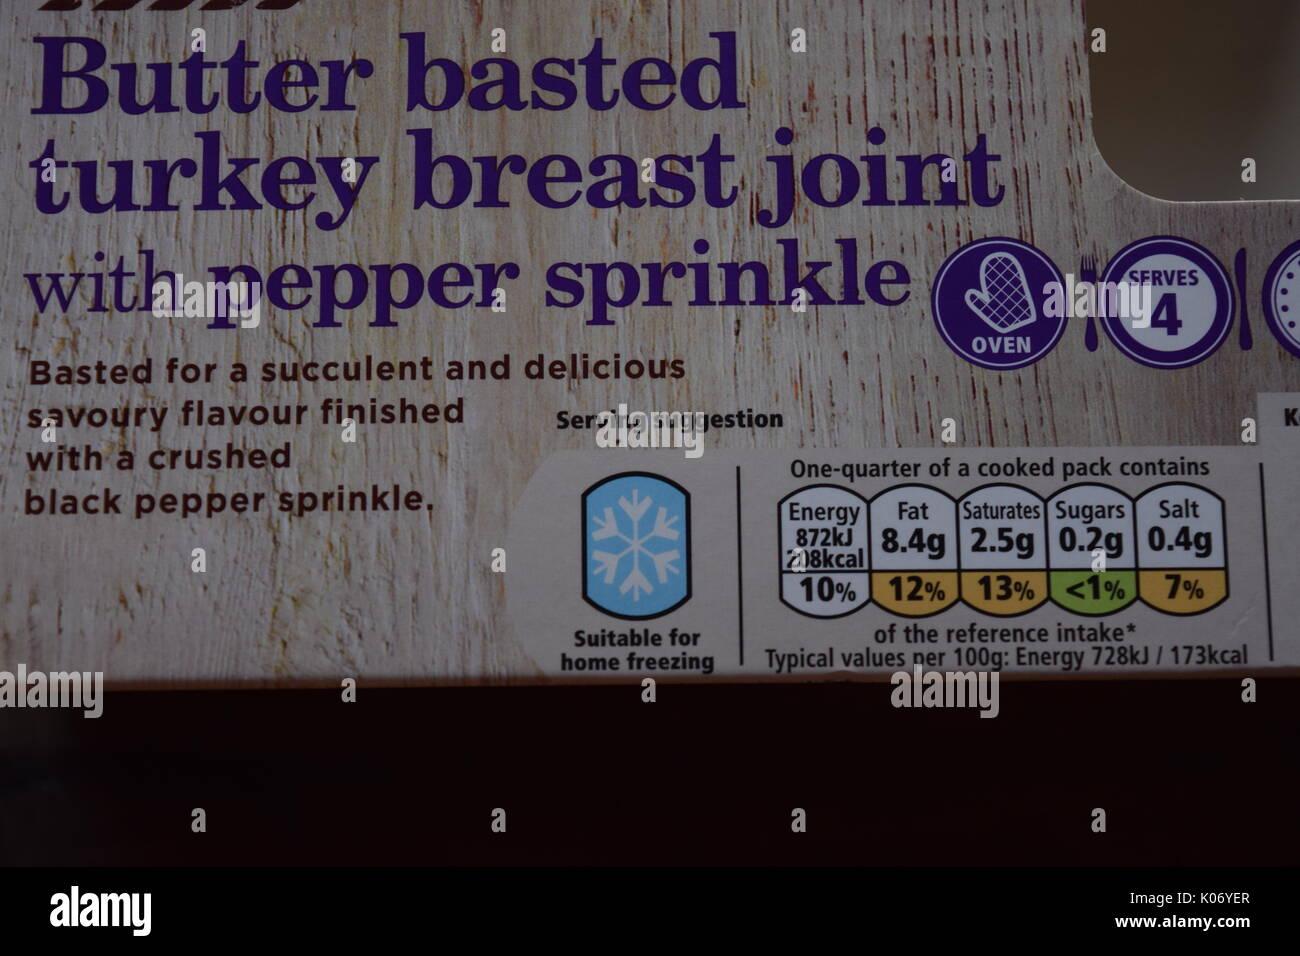 Turkey breat food label - Stock Image